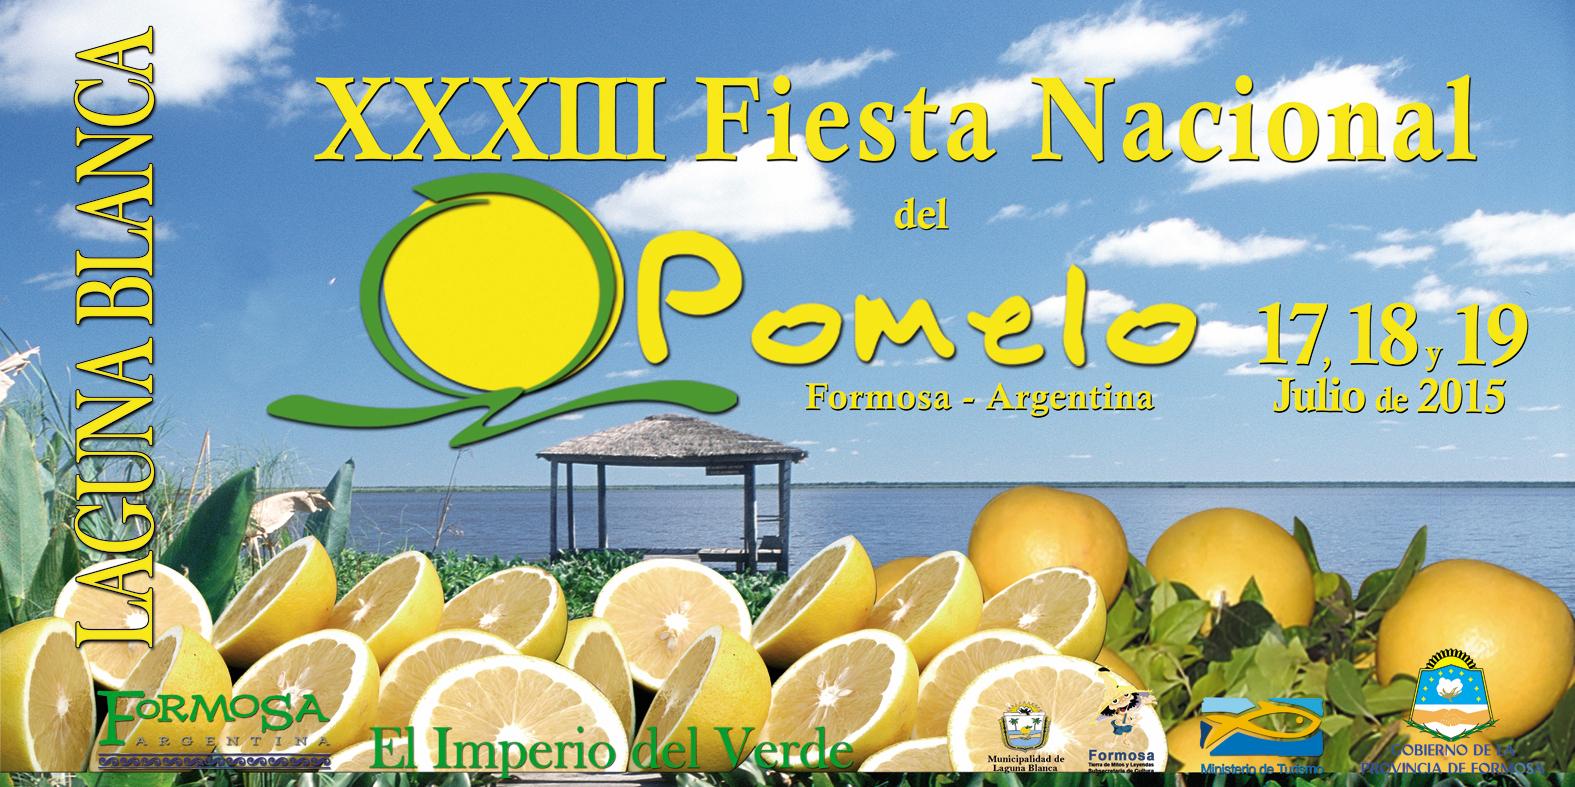 Fiesta Nacional del Pomelo Laguna Blanca @ Laguna Blanca | Formosa | Argentina